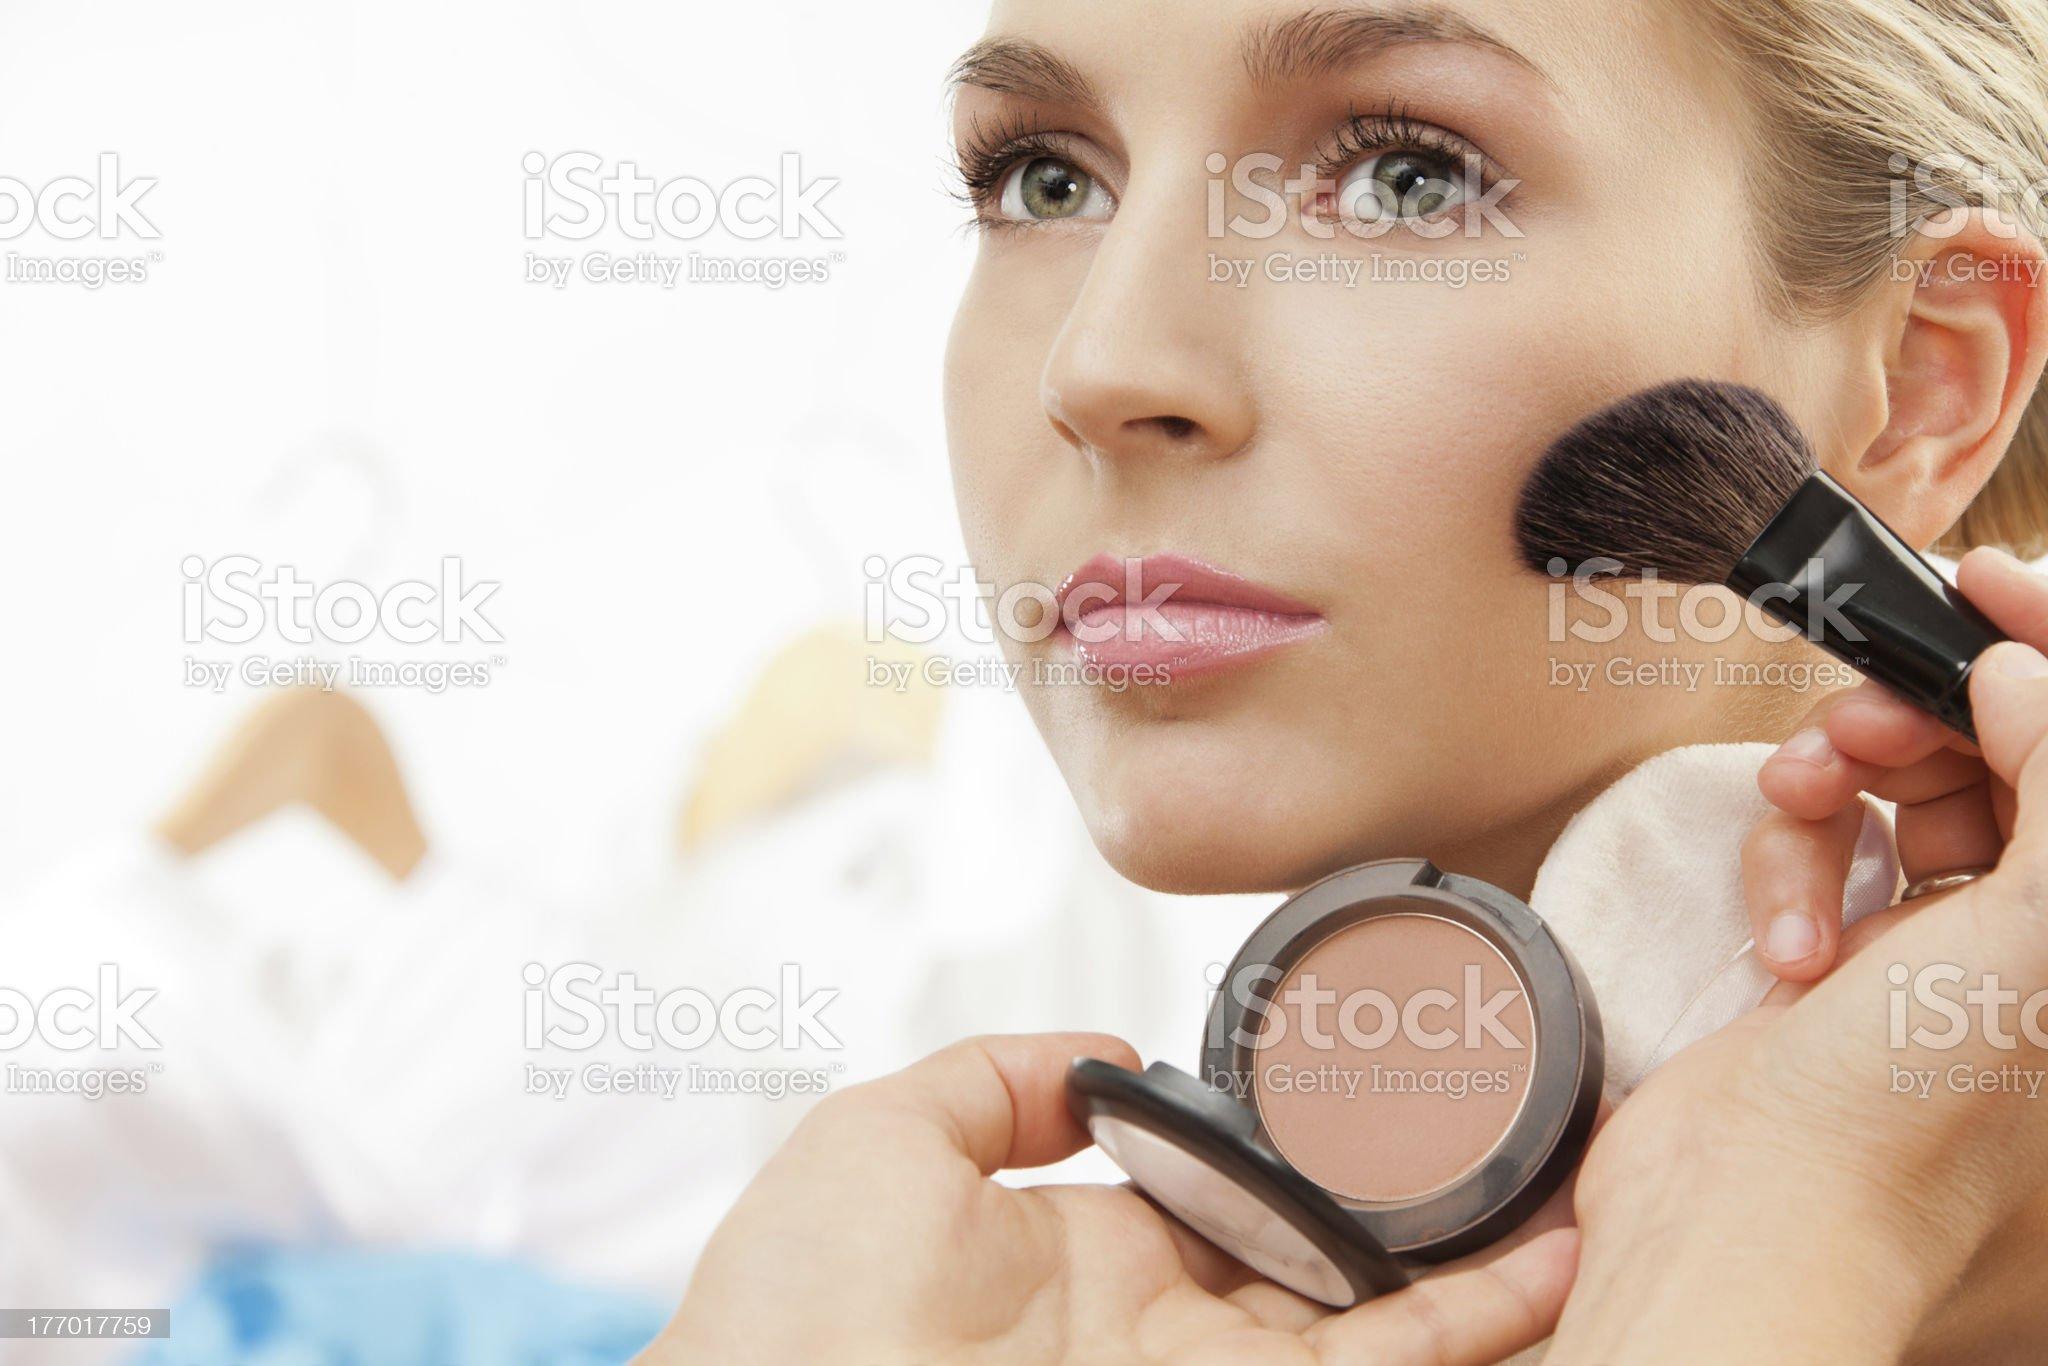 Using brush to apply blush on cheeks royalty-free stock photo